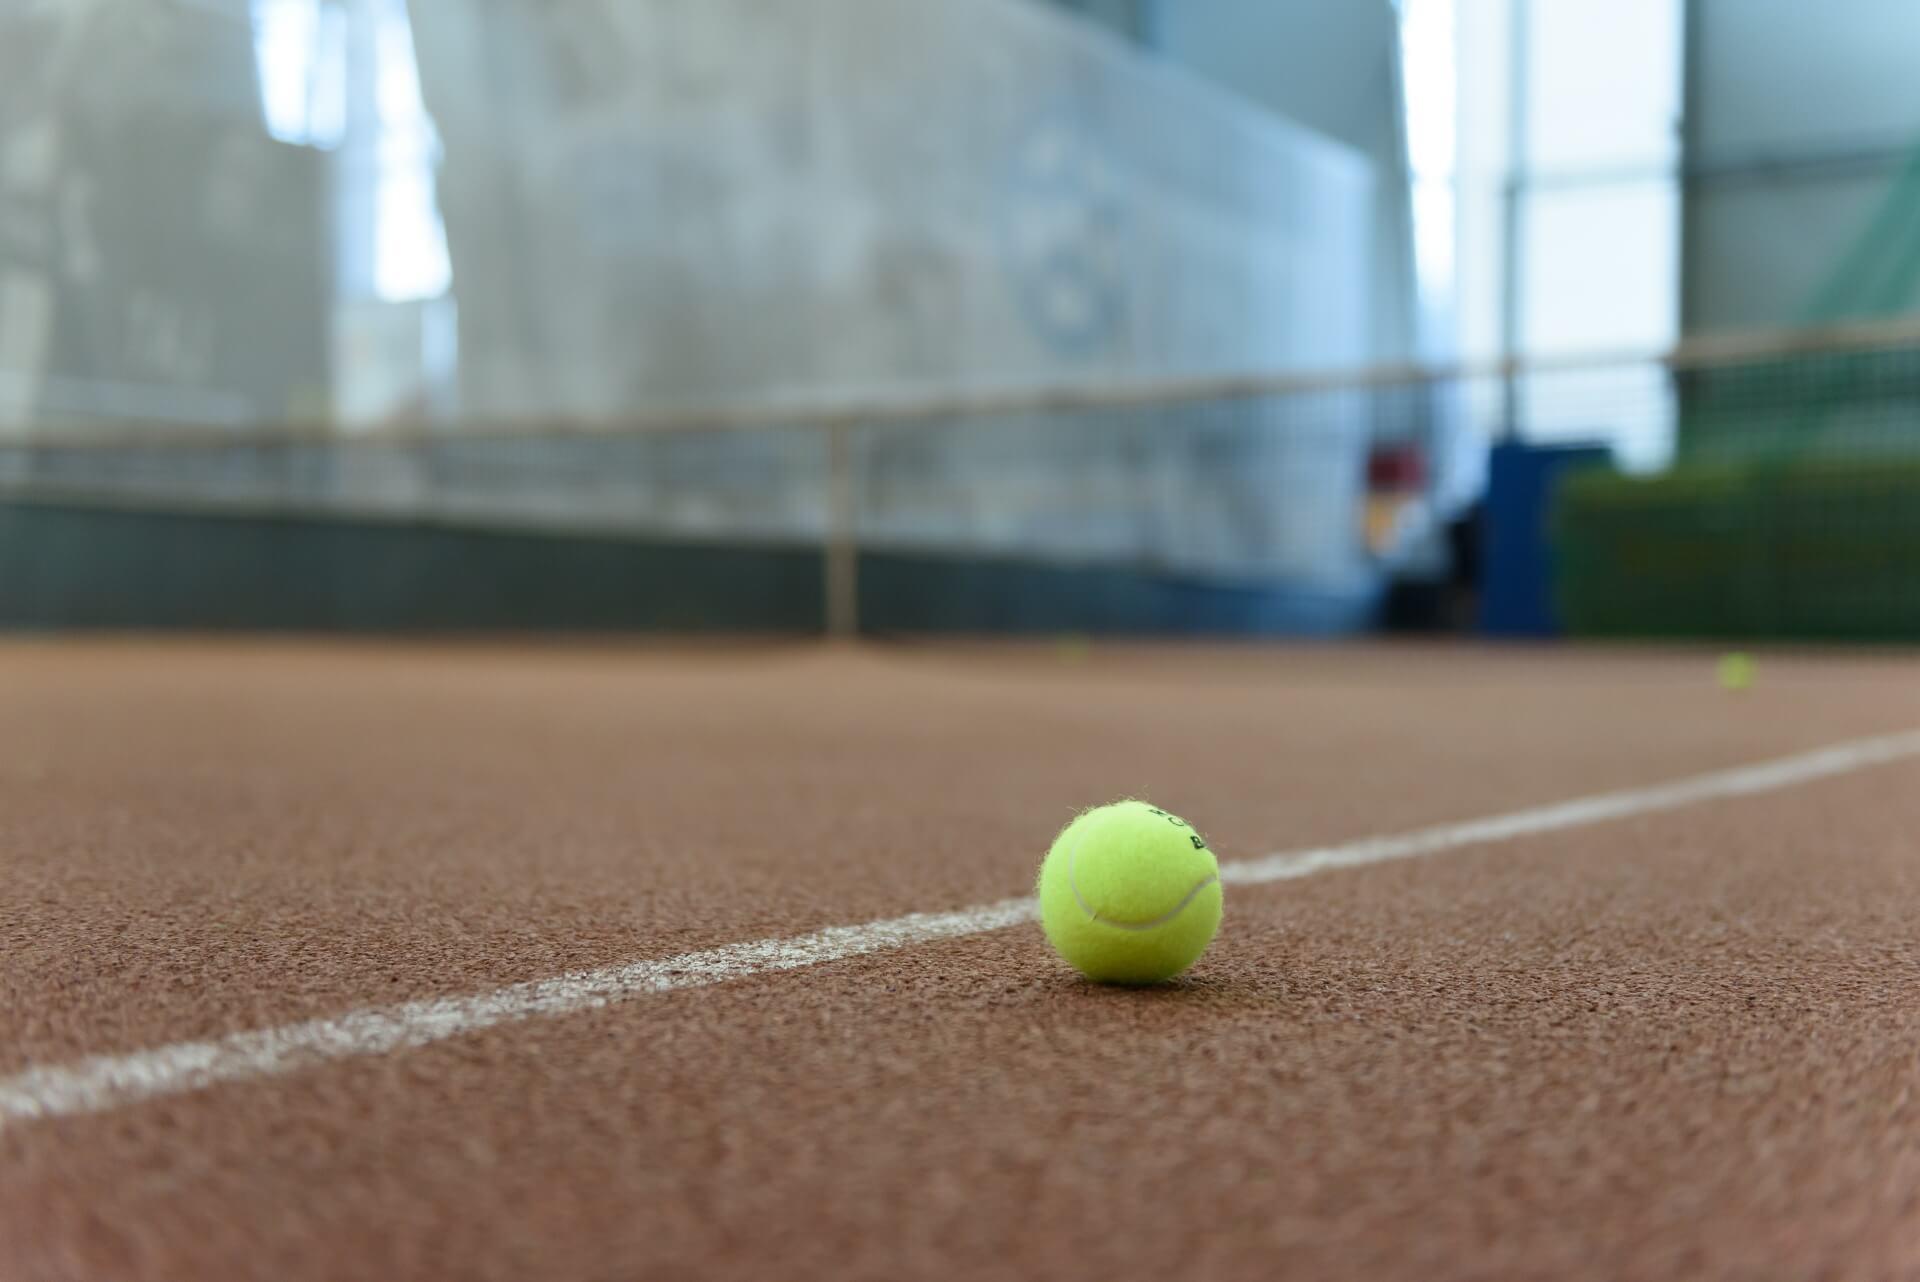 tenisa laukums